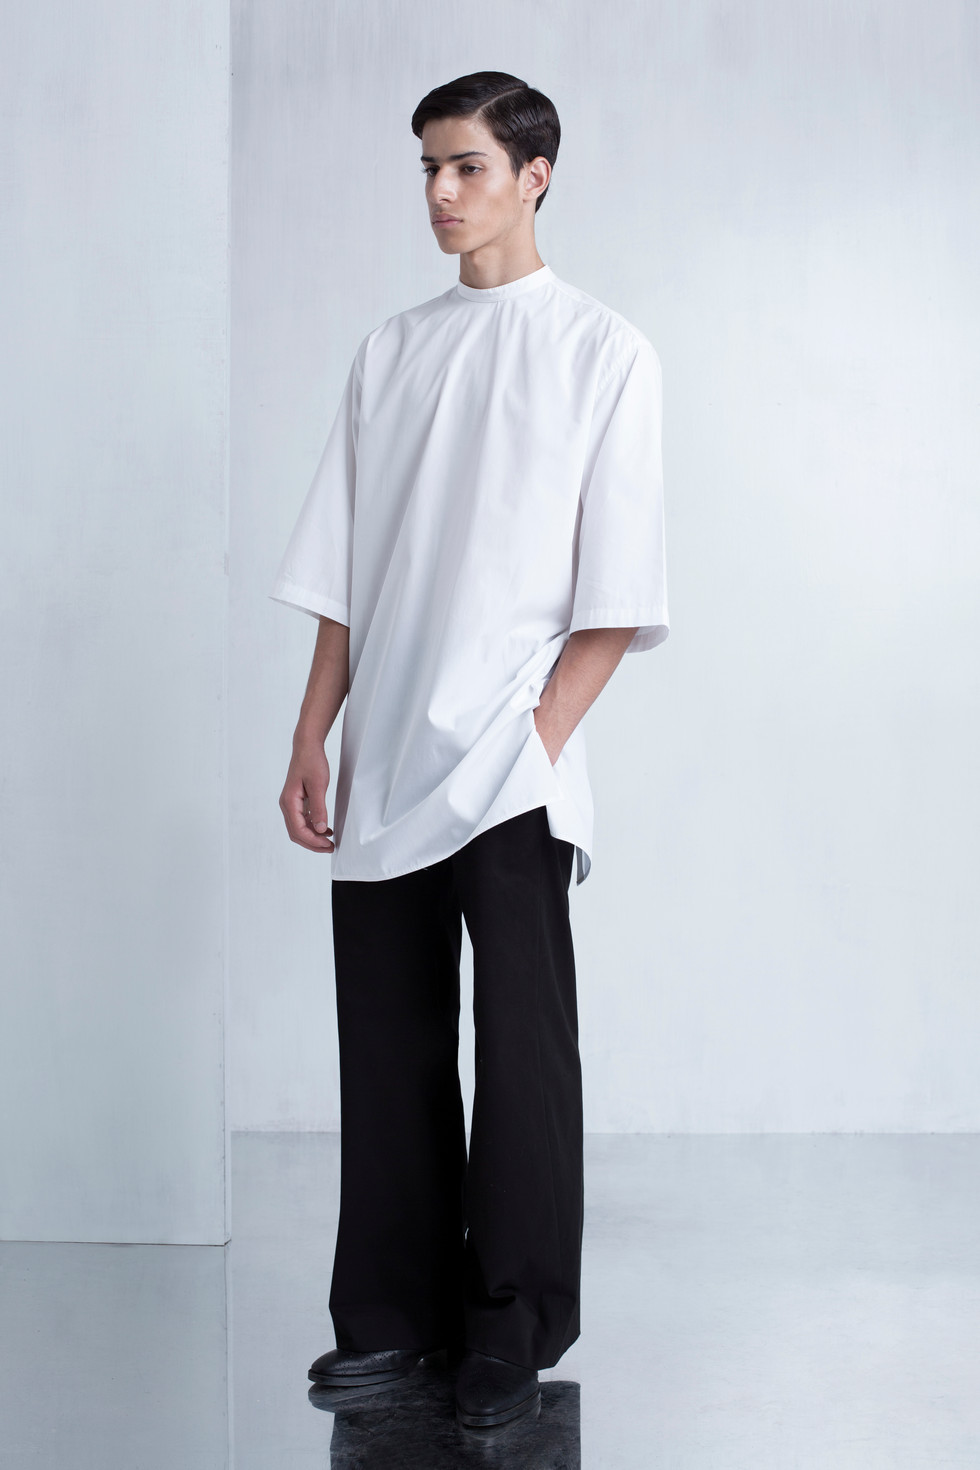 Ariel_Bassan_Minimal_Menswear_AW_LookBook_Wide_Trousers